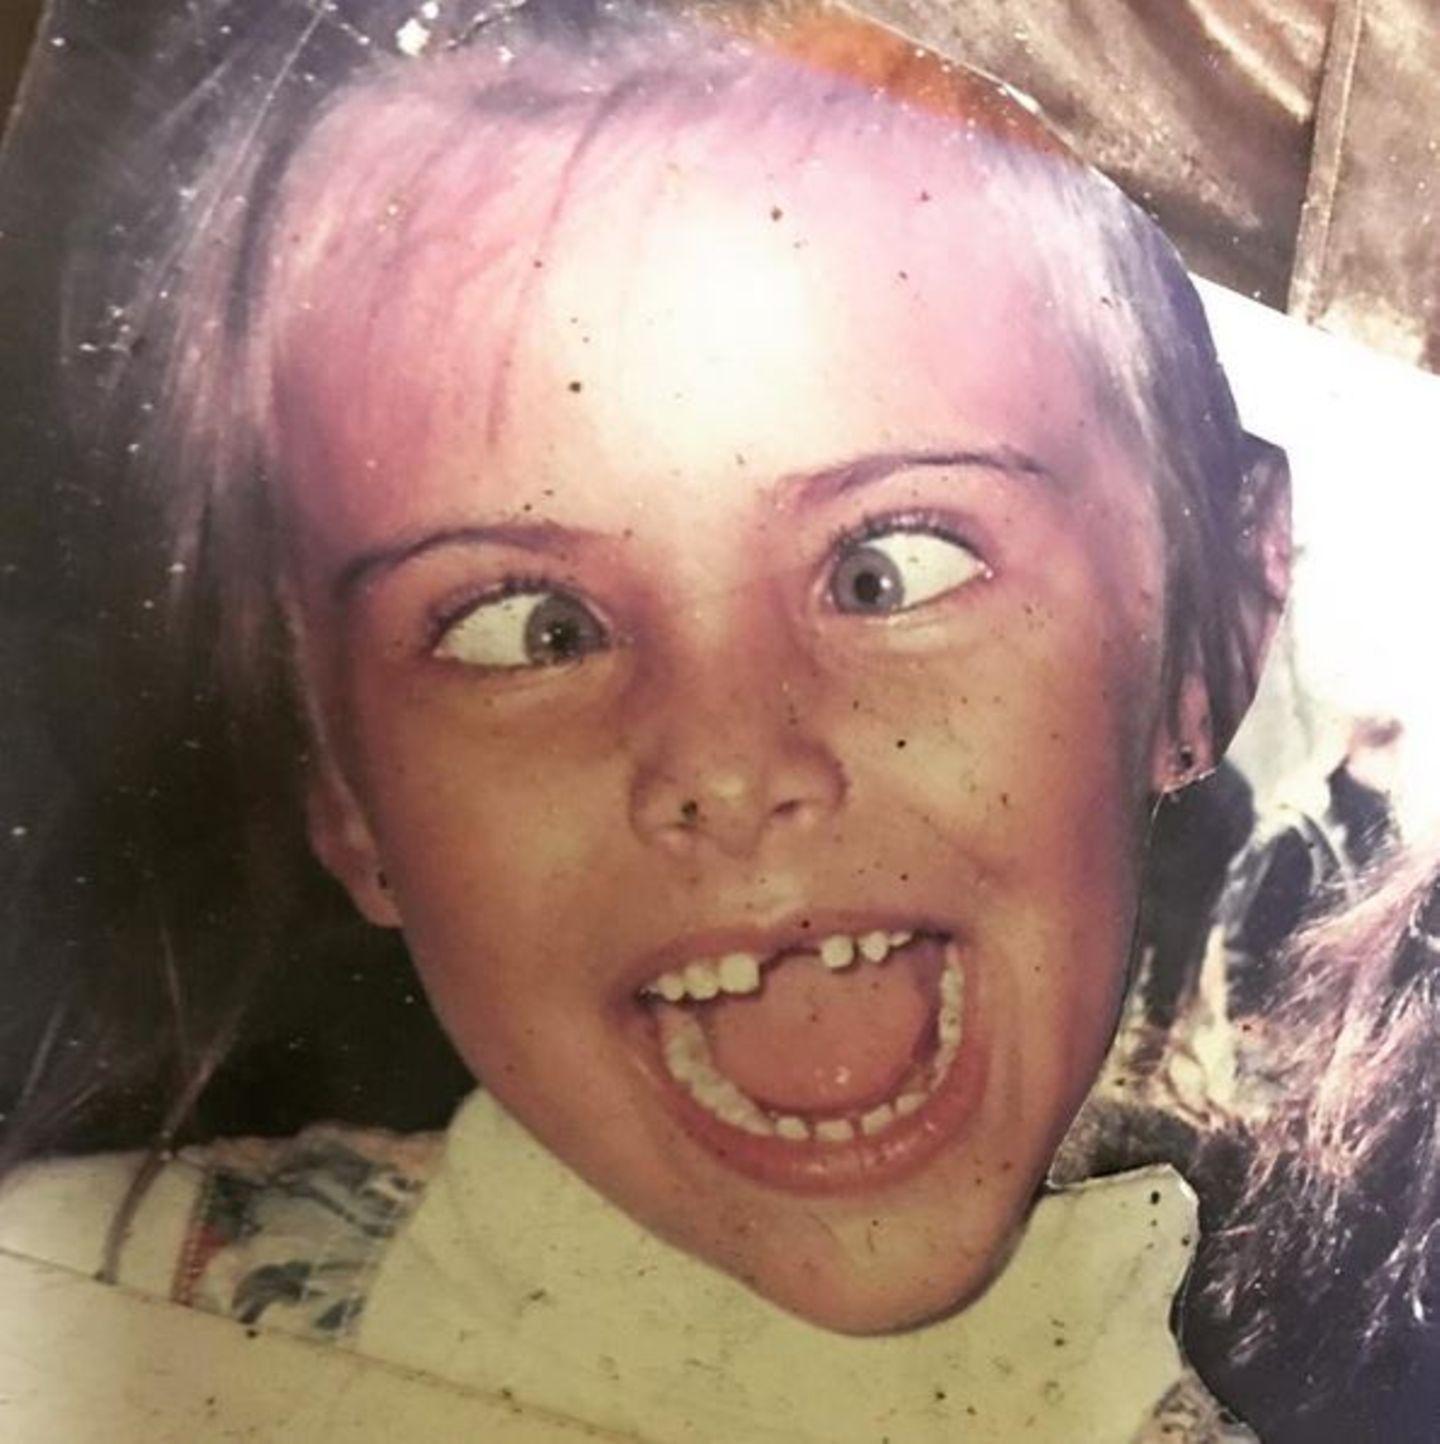 Kinderfotos der Stars: Sophia Thomalla